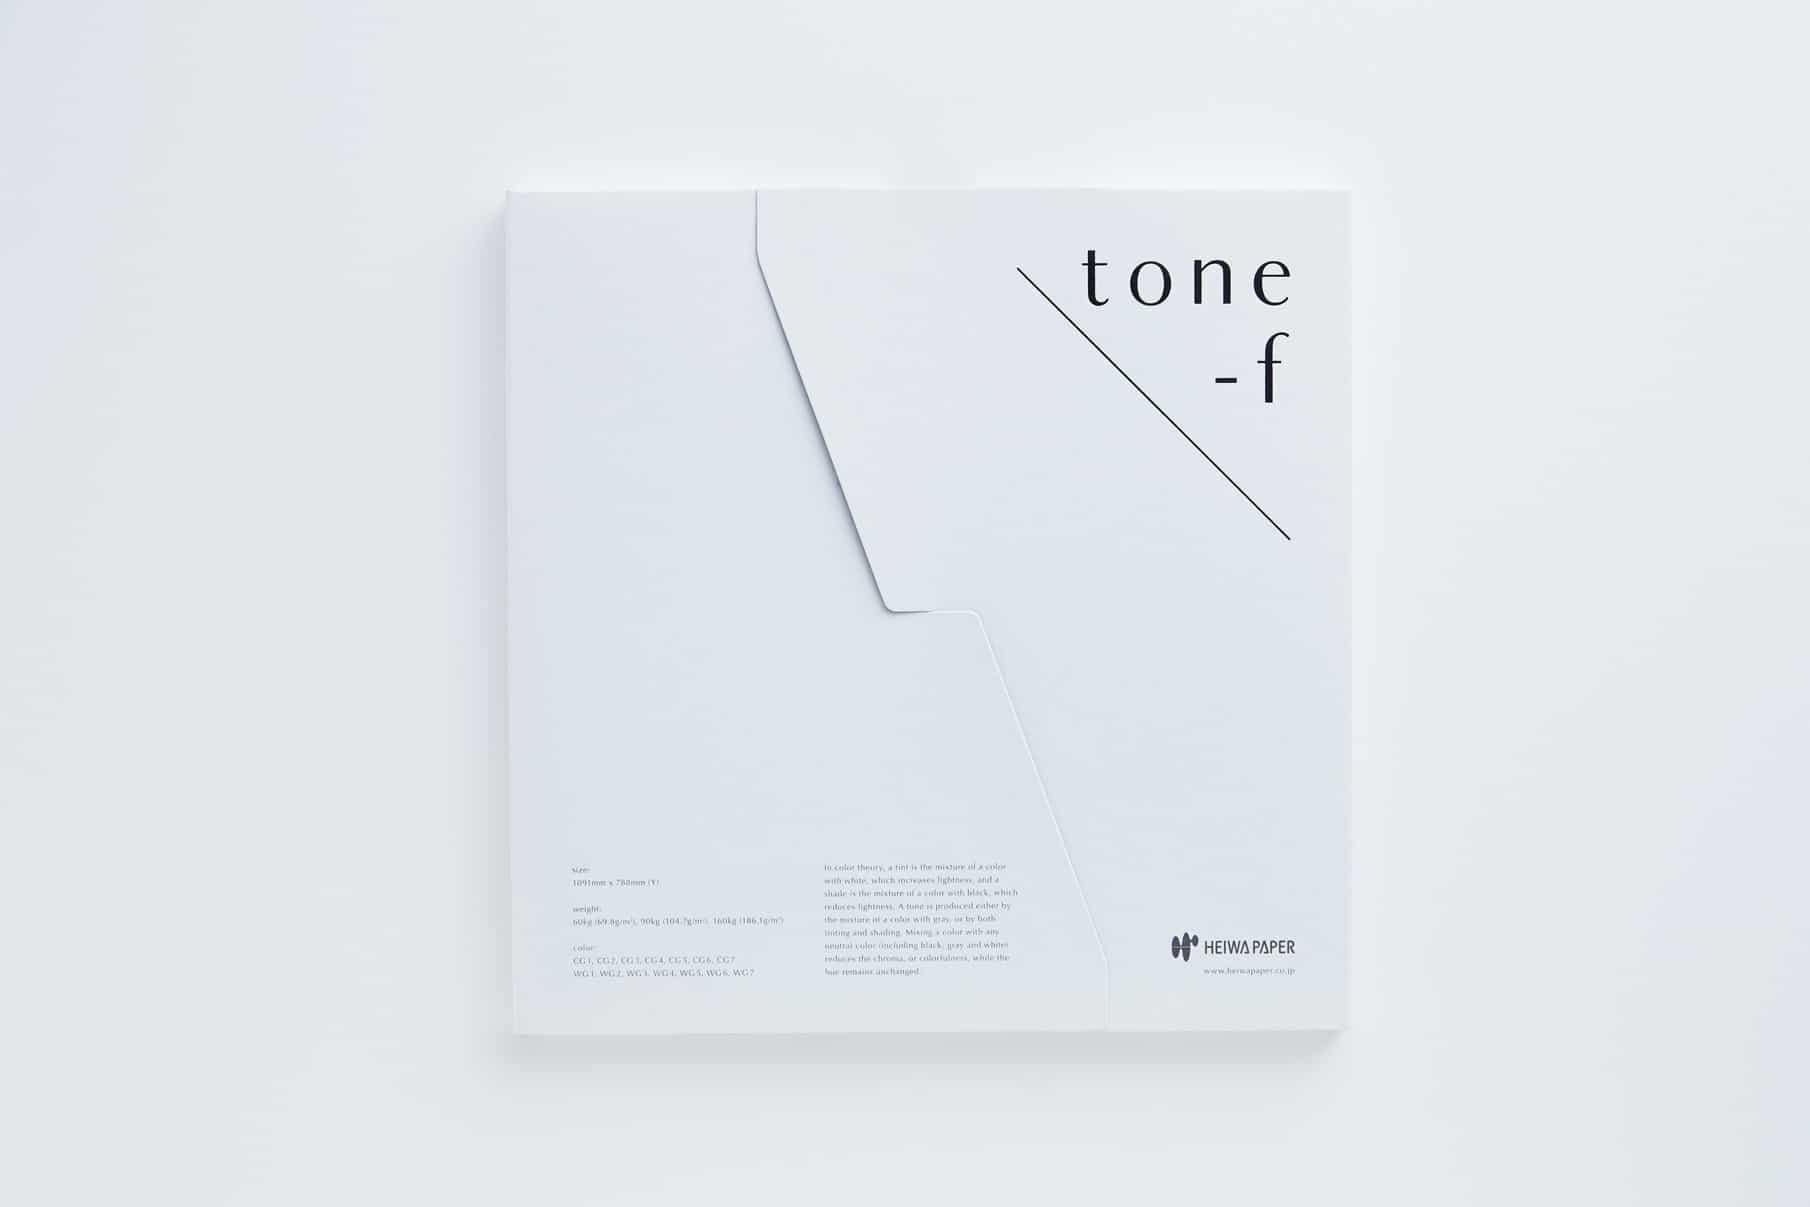 tone-f - Promotion Box 3